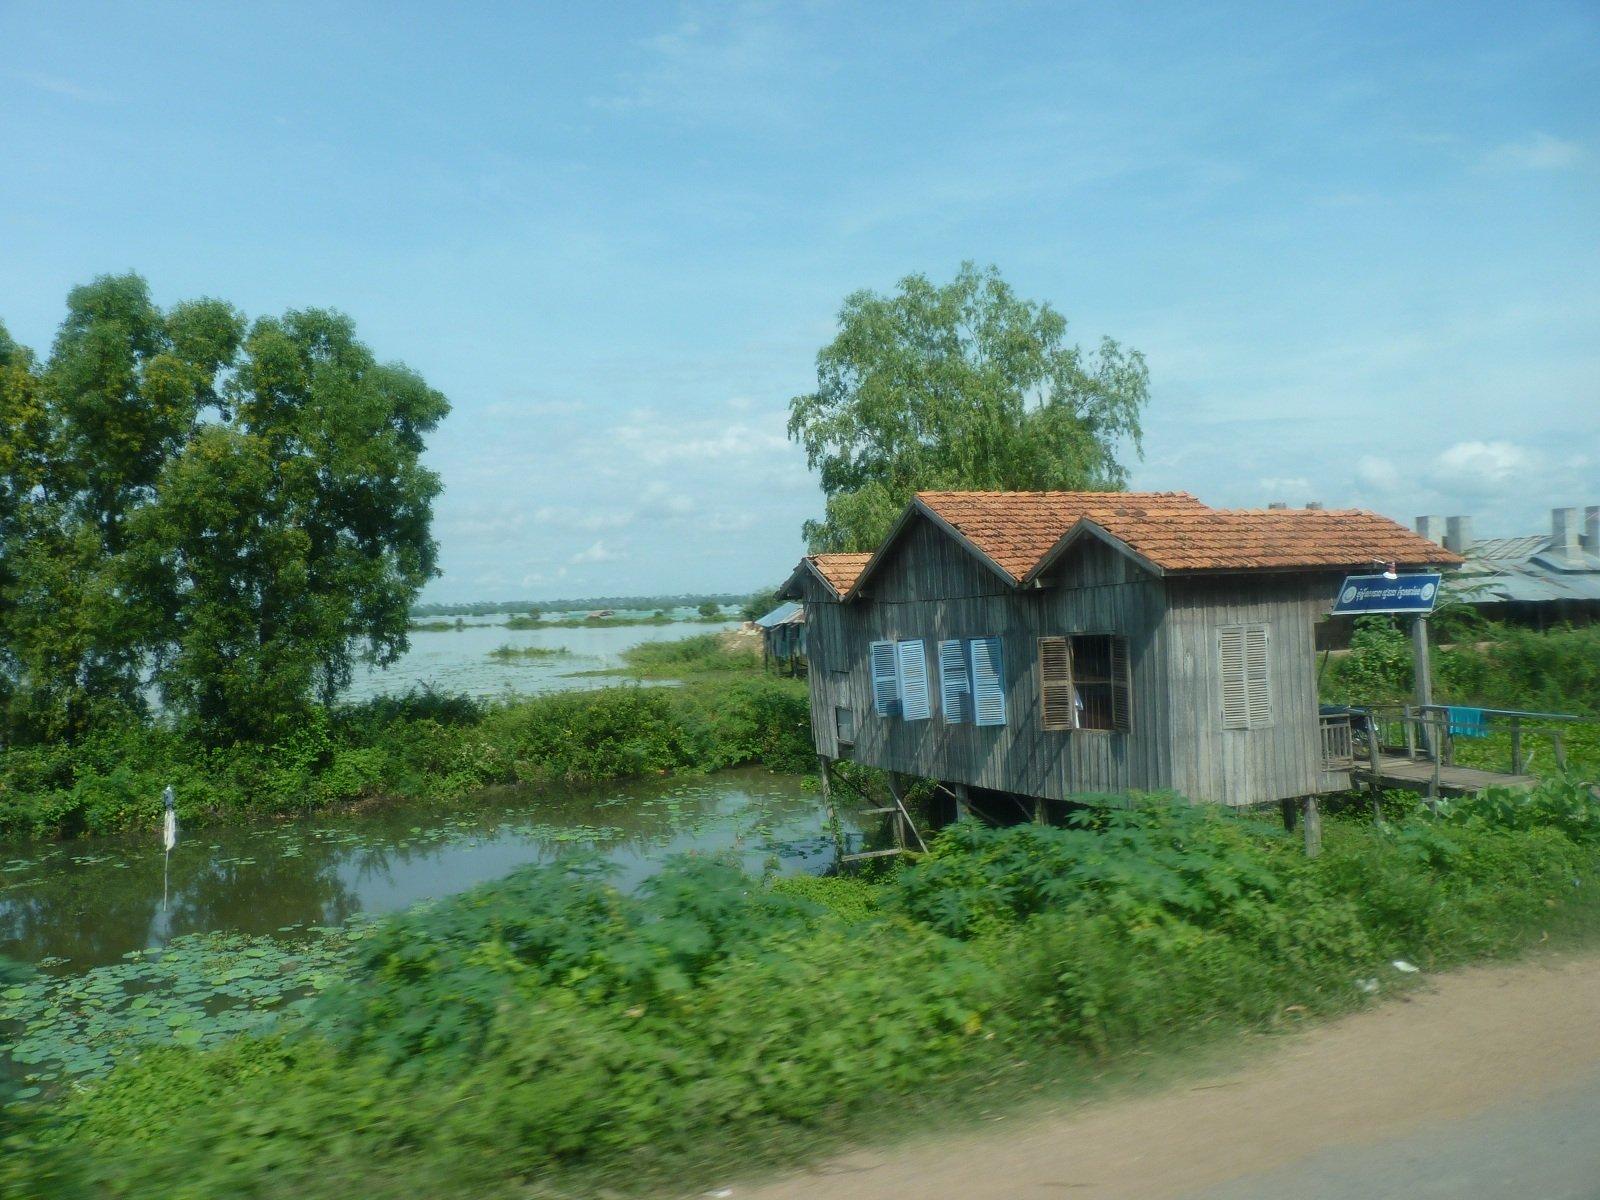 Séjour à Mondul Kiri at Icam-bodge humanitaire